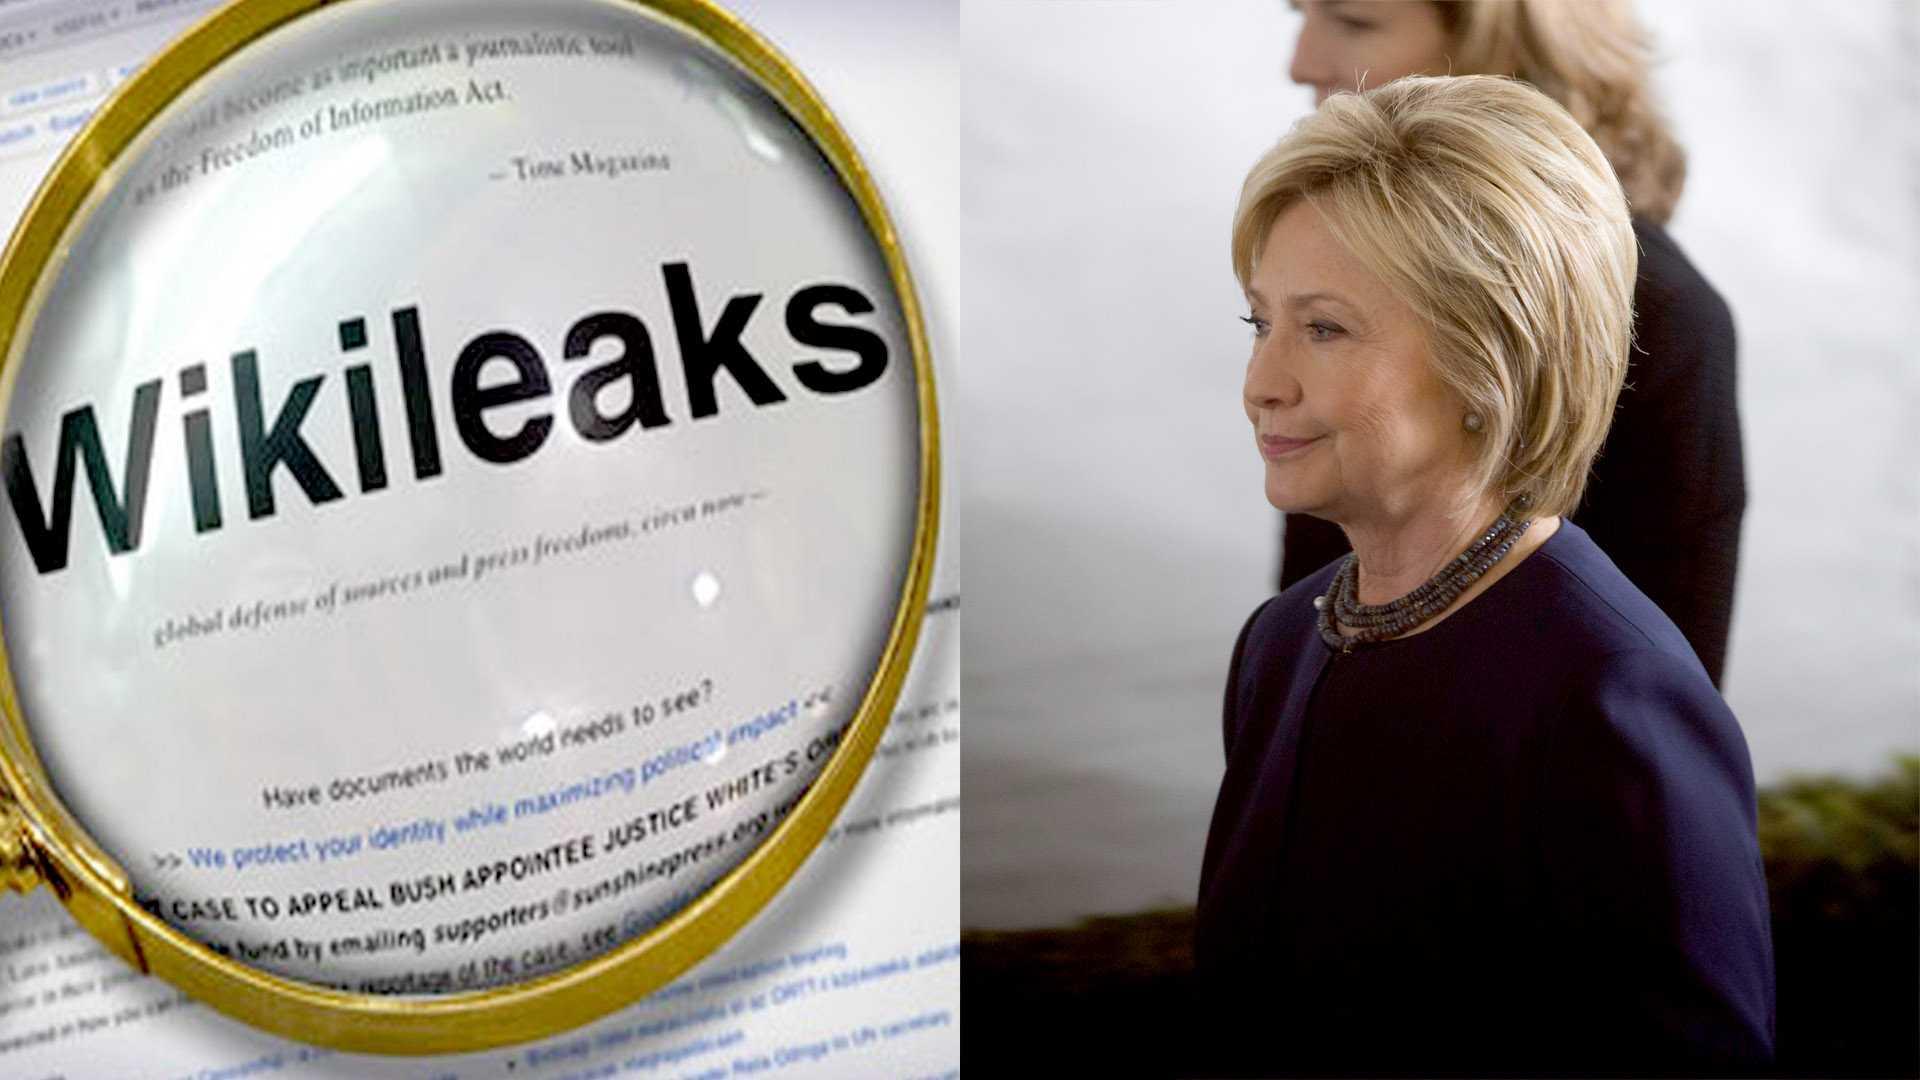 Julian Assange: Clinton has been eaten alive by her ambition